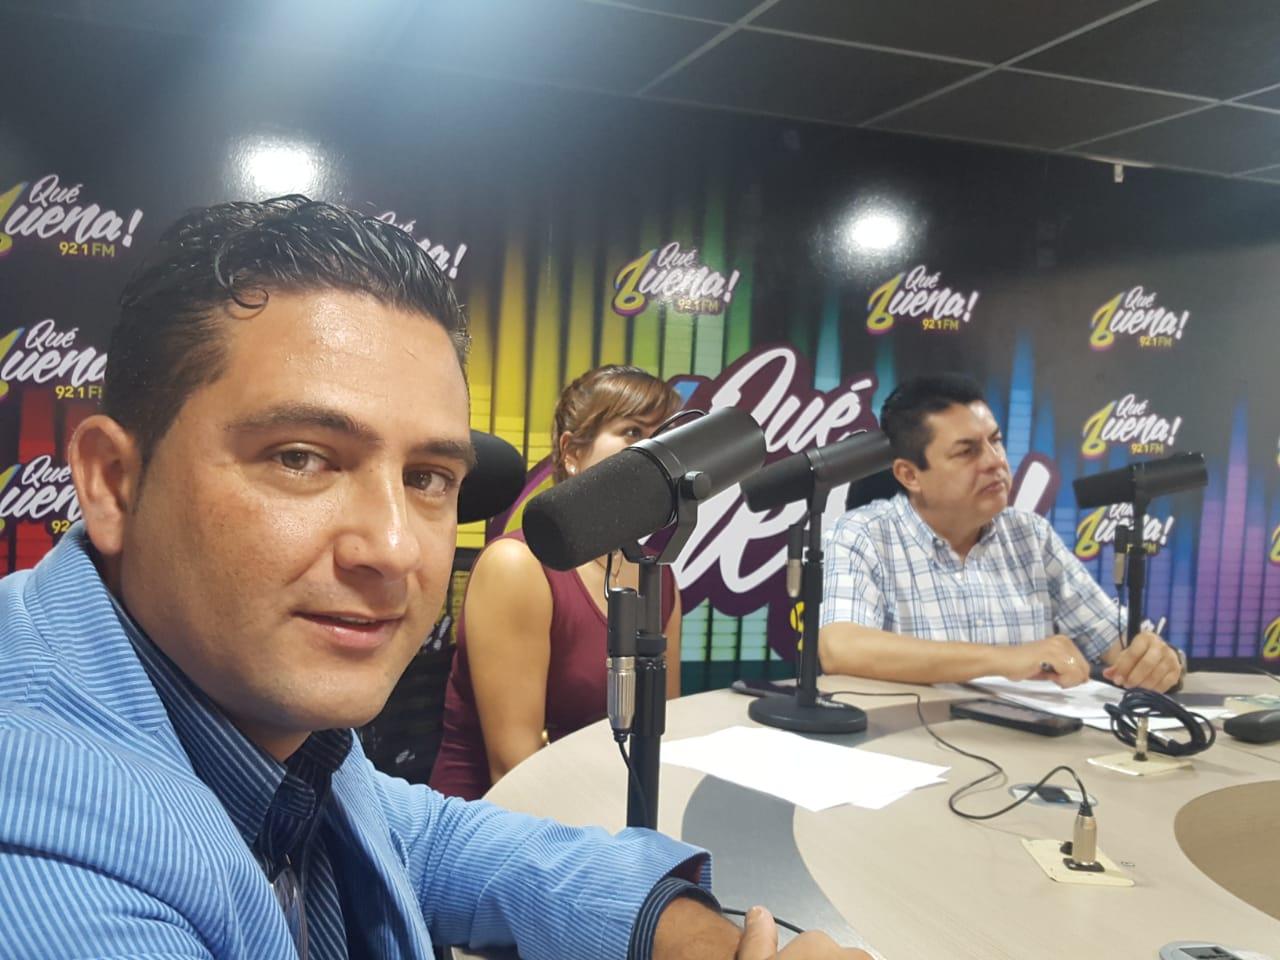 Resultado de imagen para PRESIDENTE cONCEJO DE dOSQUEBRADAS